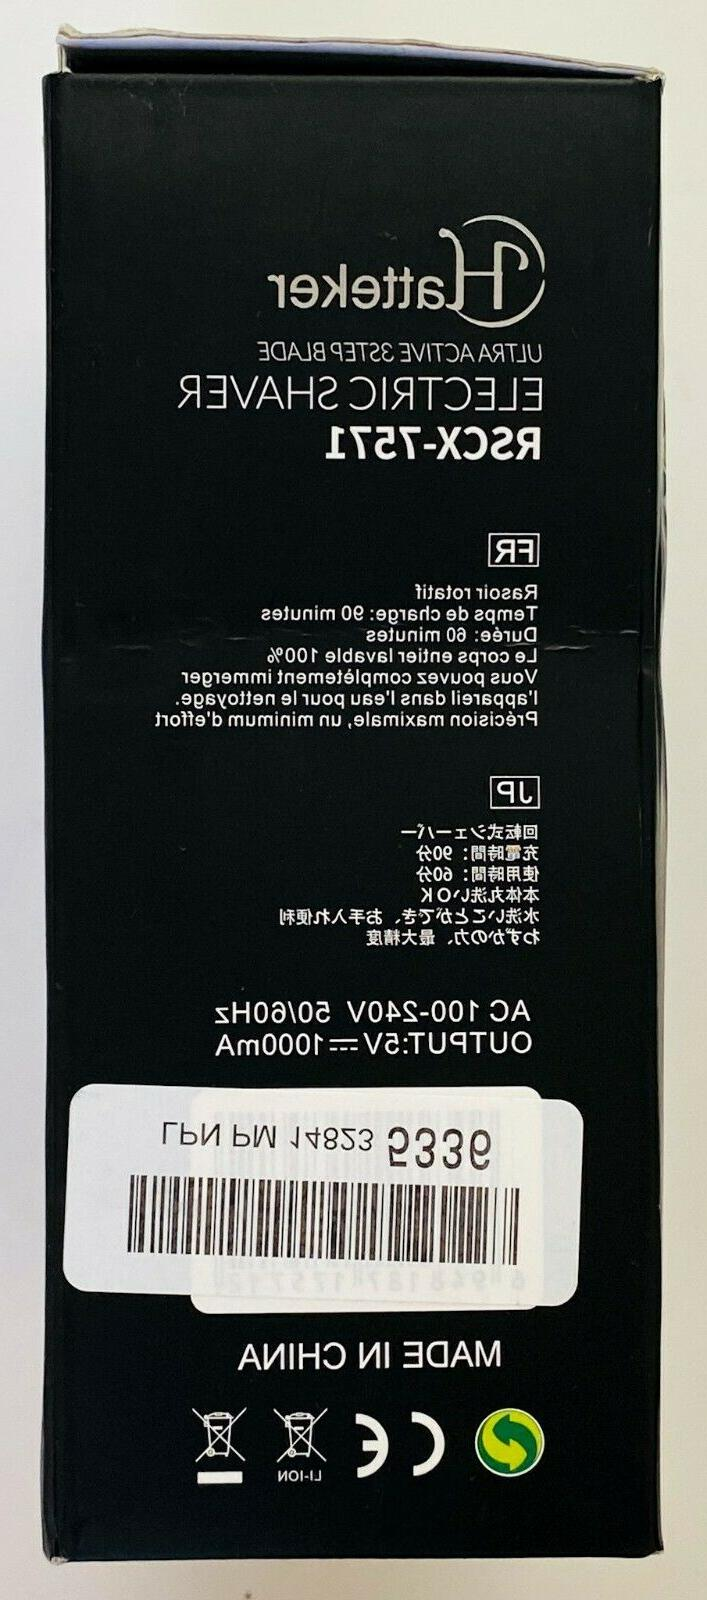 Hatteker Dry Electric Shaver Trimmer RSCX-7571 Waterproof